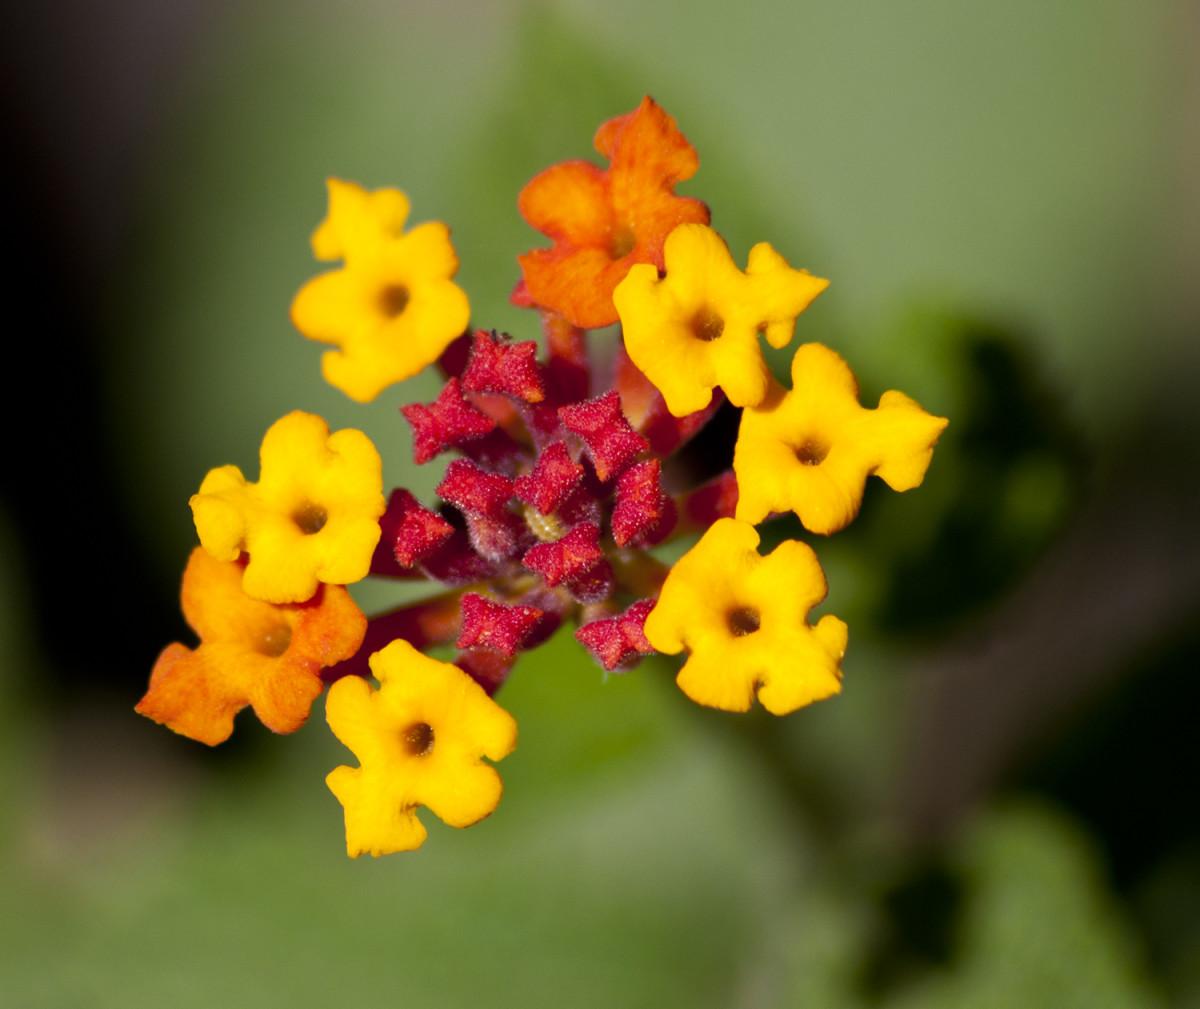 Tiny Flowers on Weeds